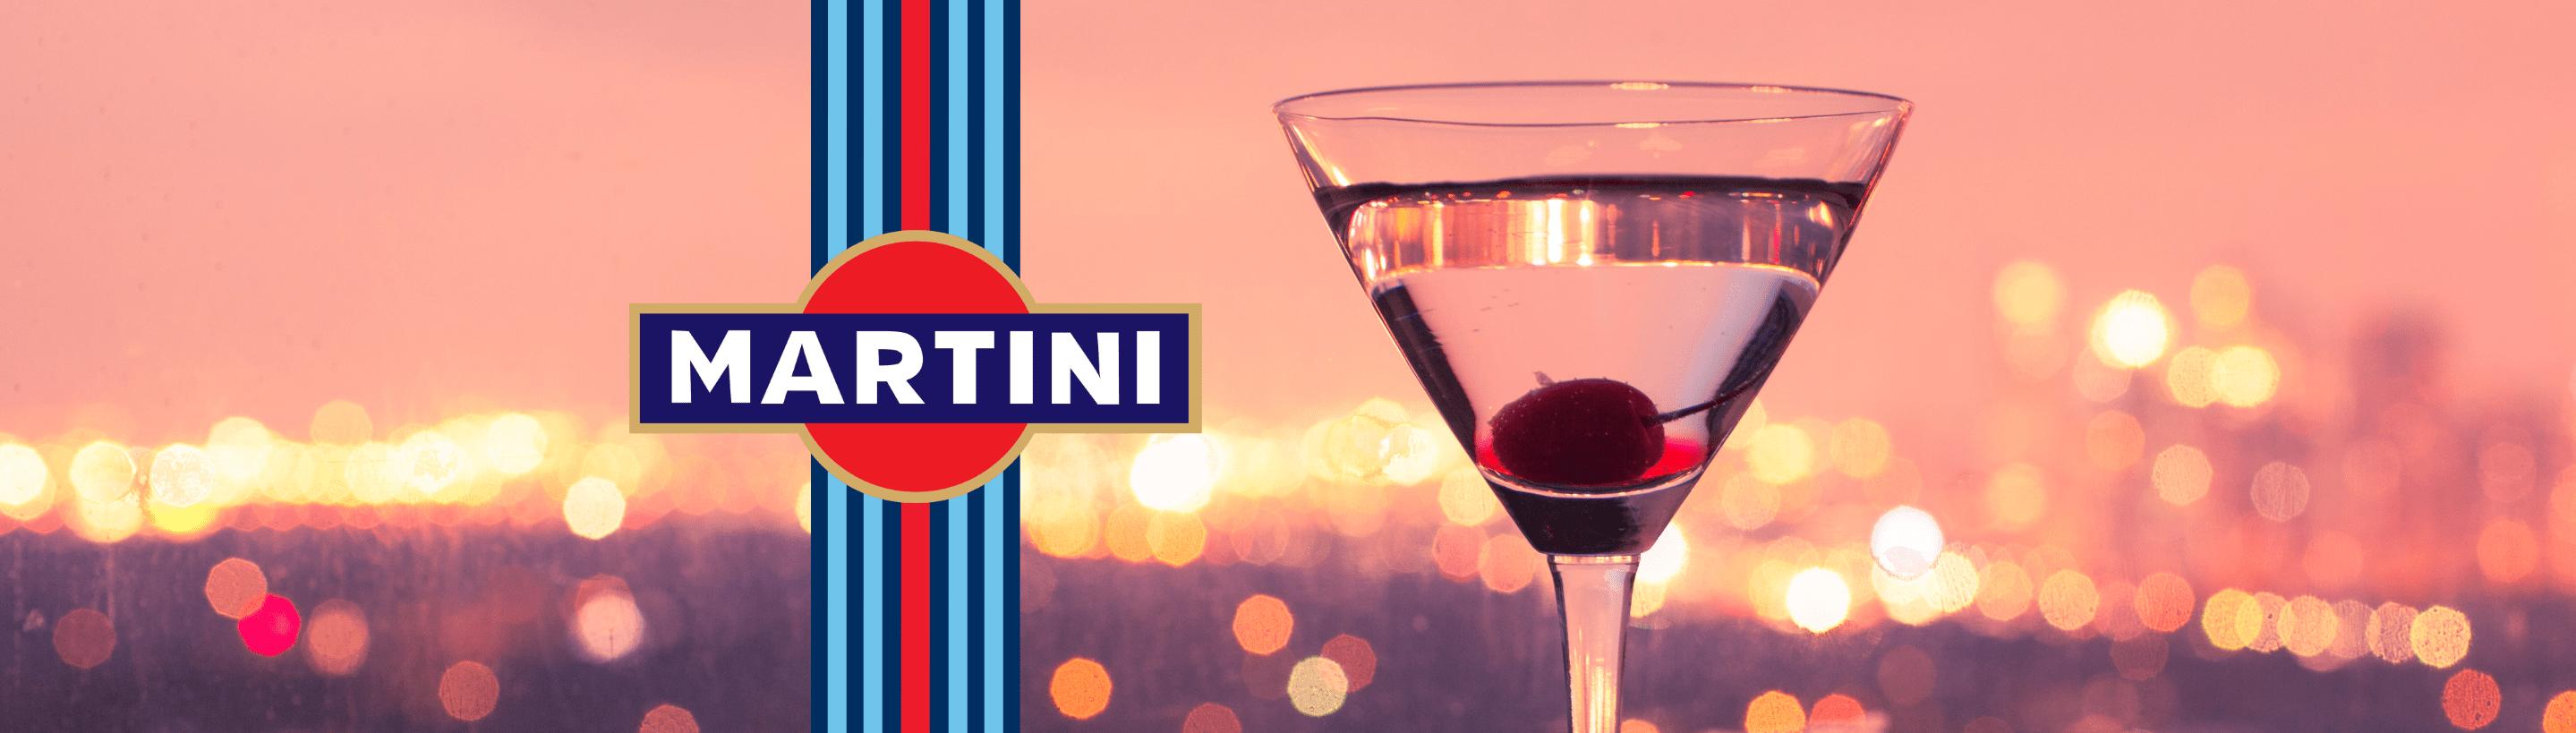 martini-header